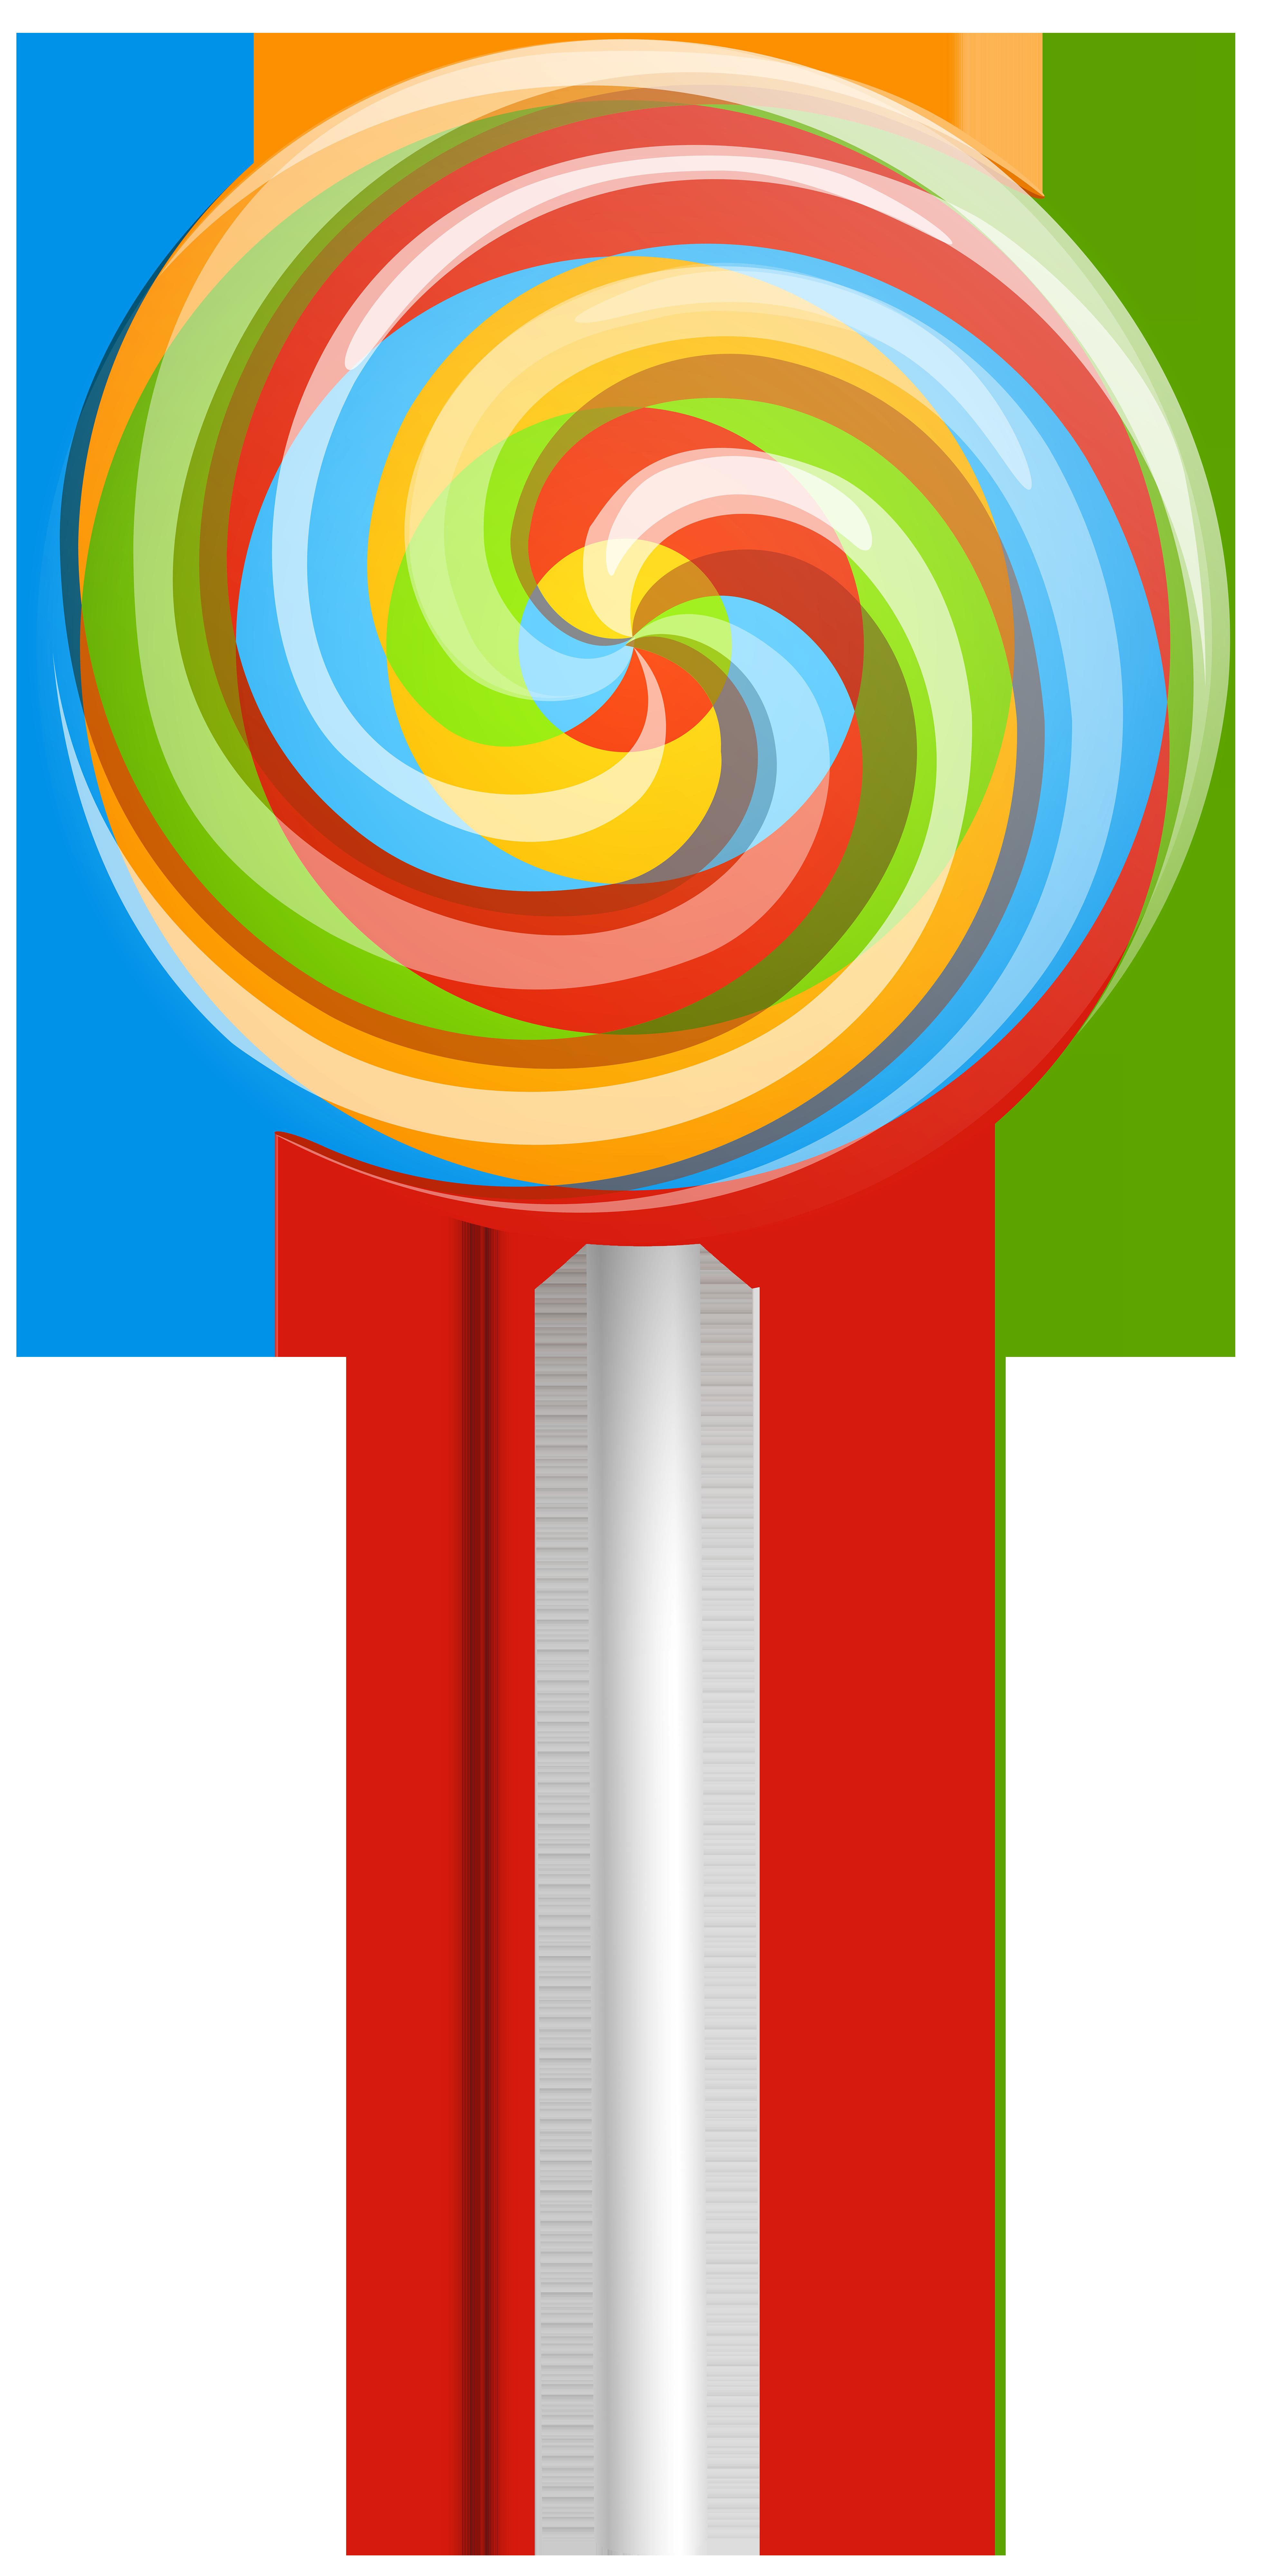 3919x8000 Rainbow Swirl Lollipop Png Clip Art Imageu200b Gallery Yopriceville